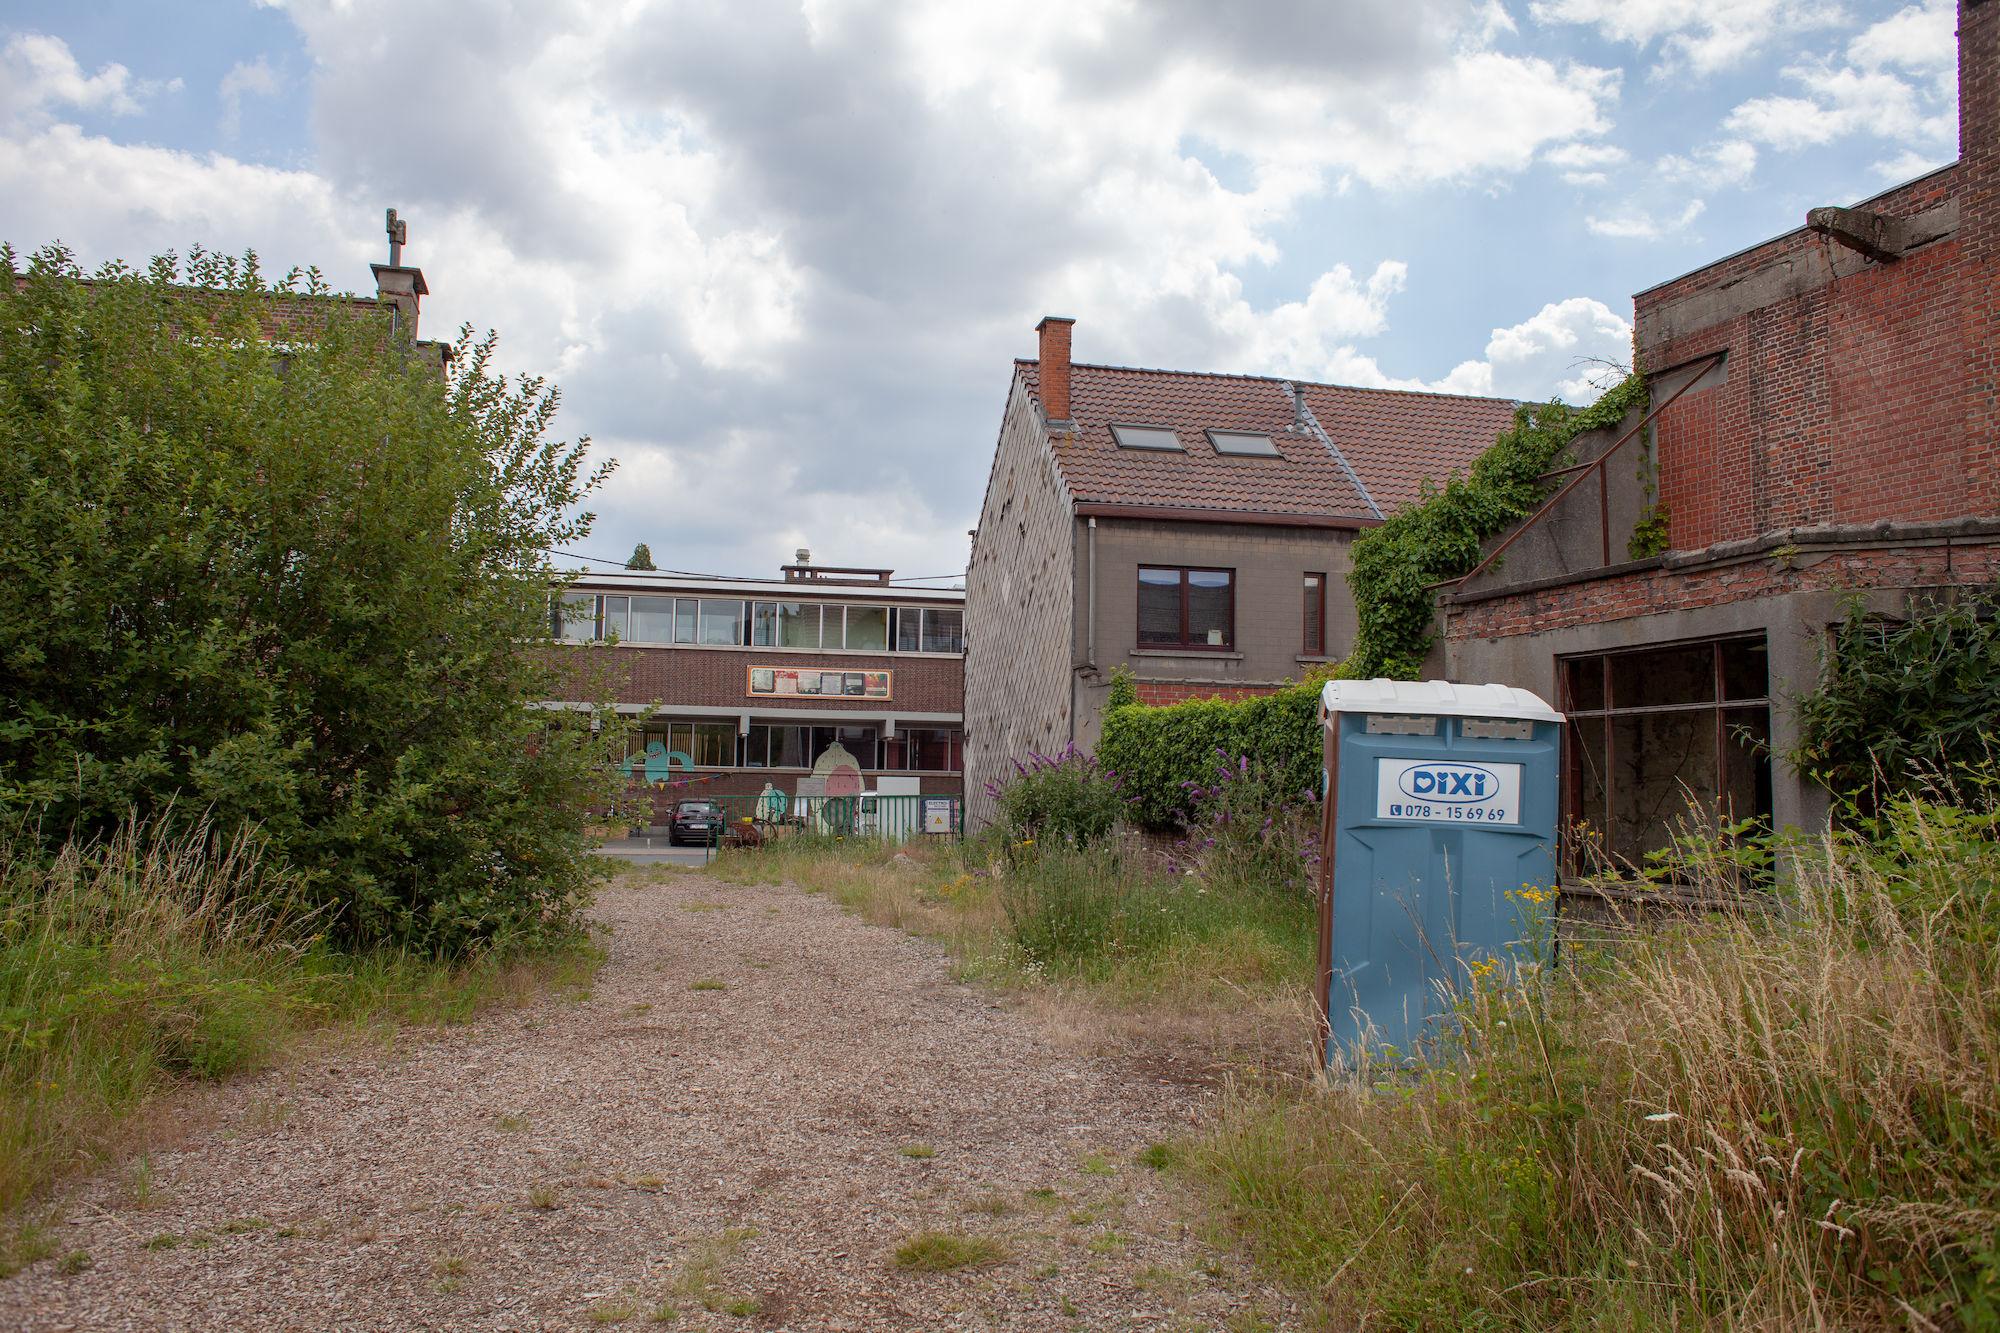 2019-07-02 Muide Meulestede prospectie Wannes_stadsvernieuwing_IMG_0333-3.jpg